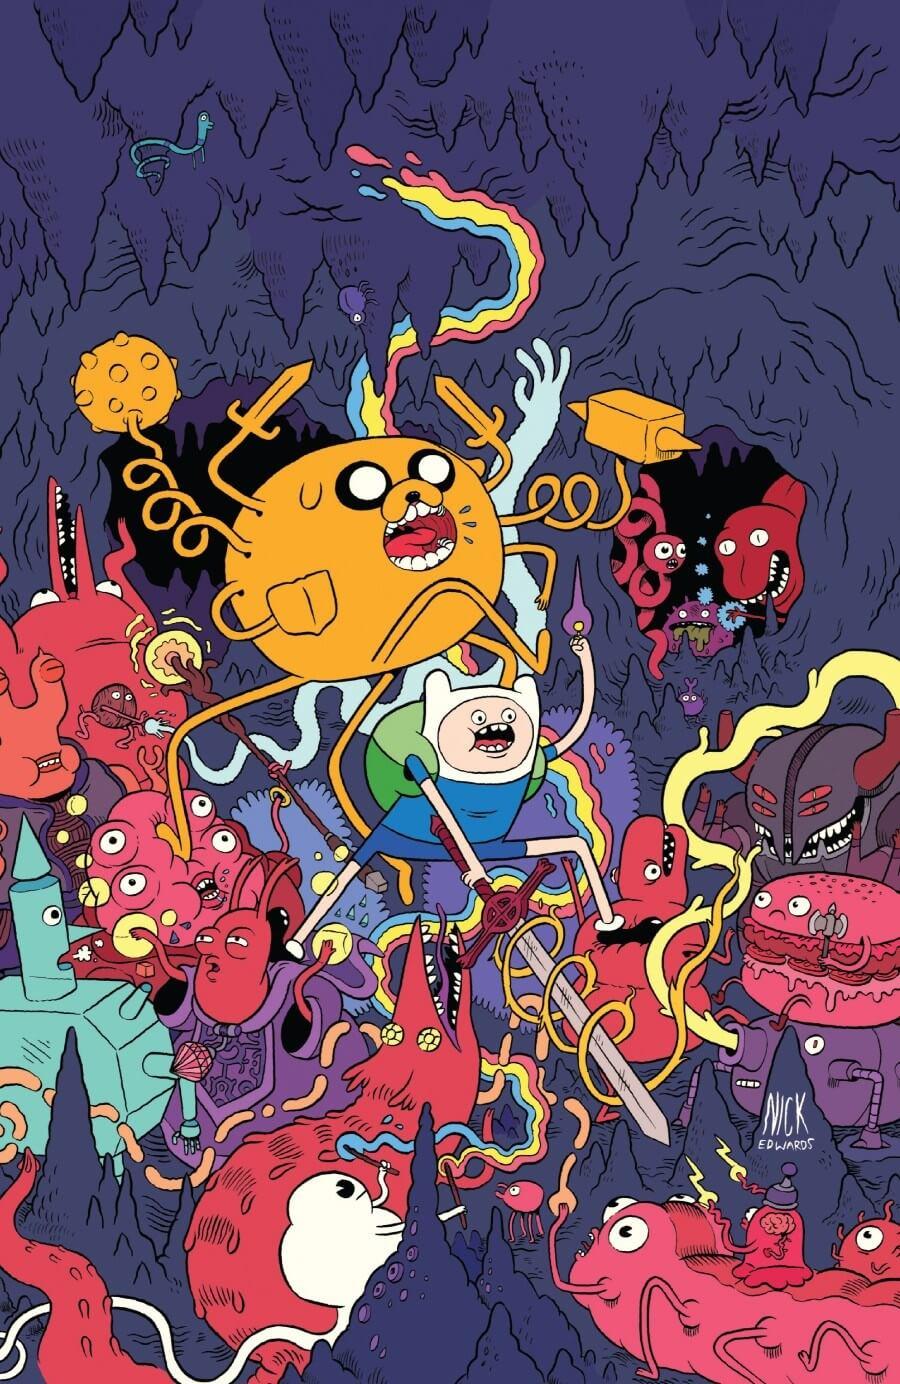 Adventure Wallpaper - Adventure Time Cover Art , HD Wallpaper & Backgrounds